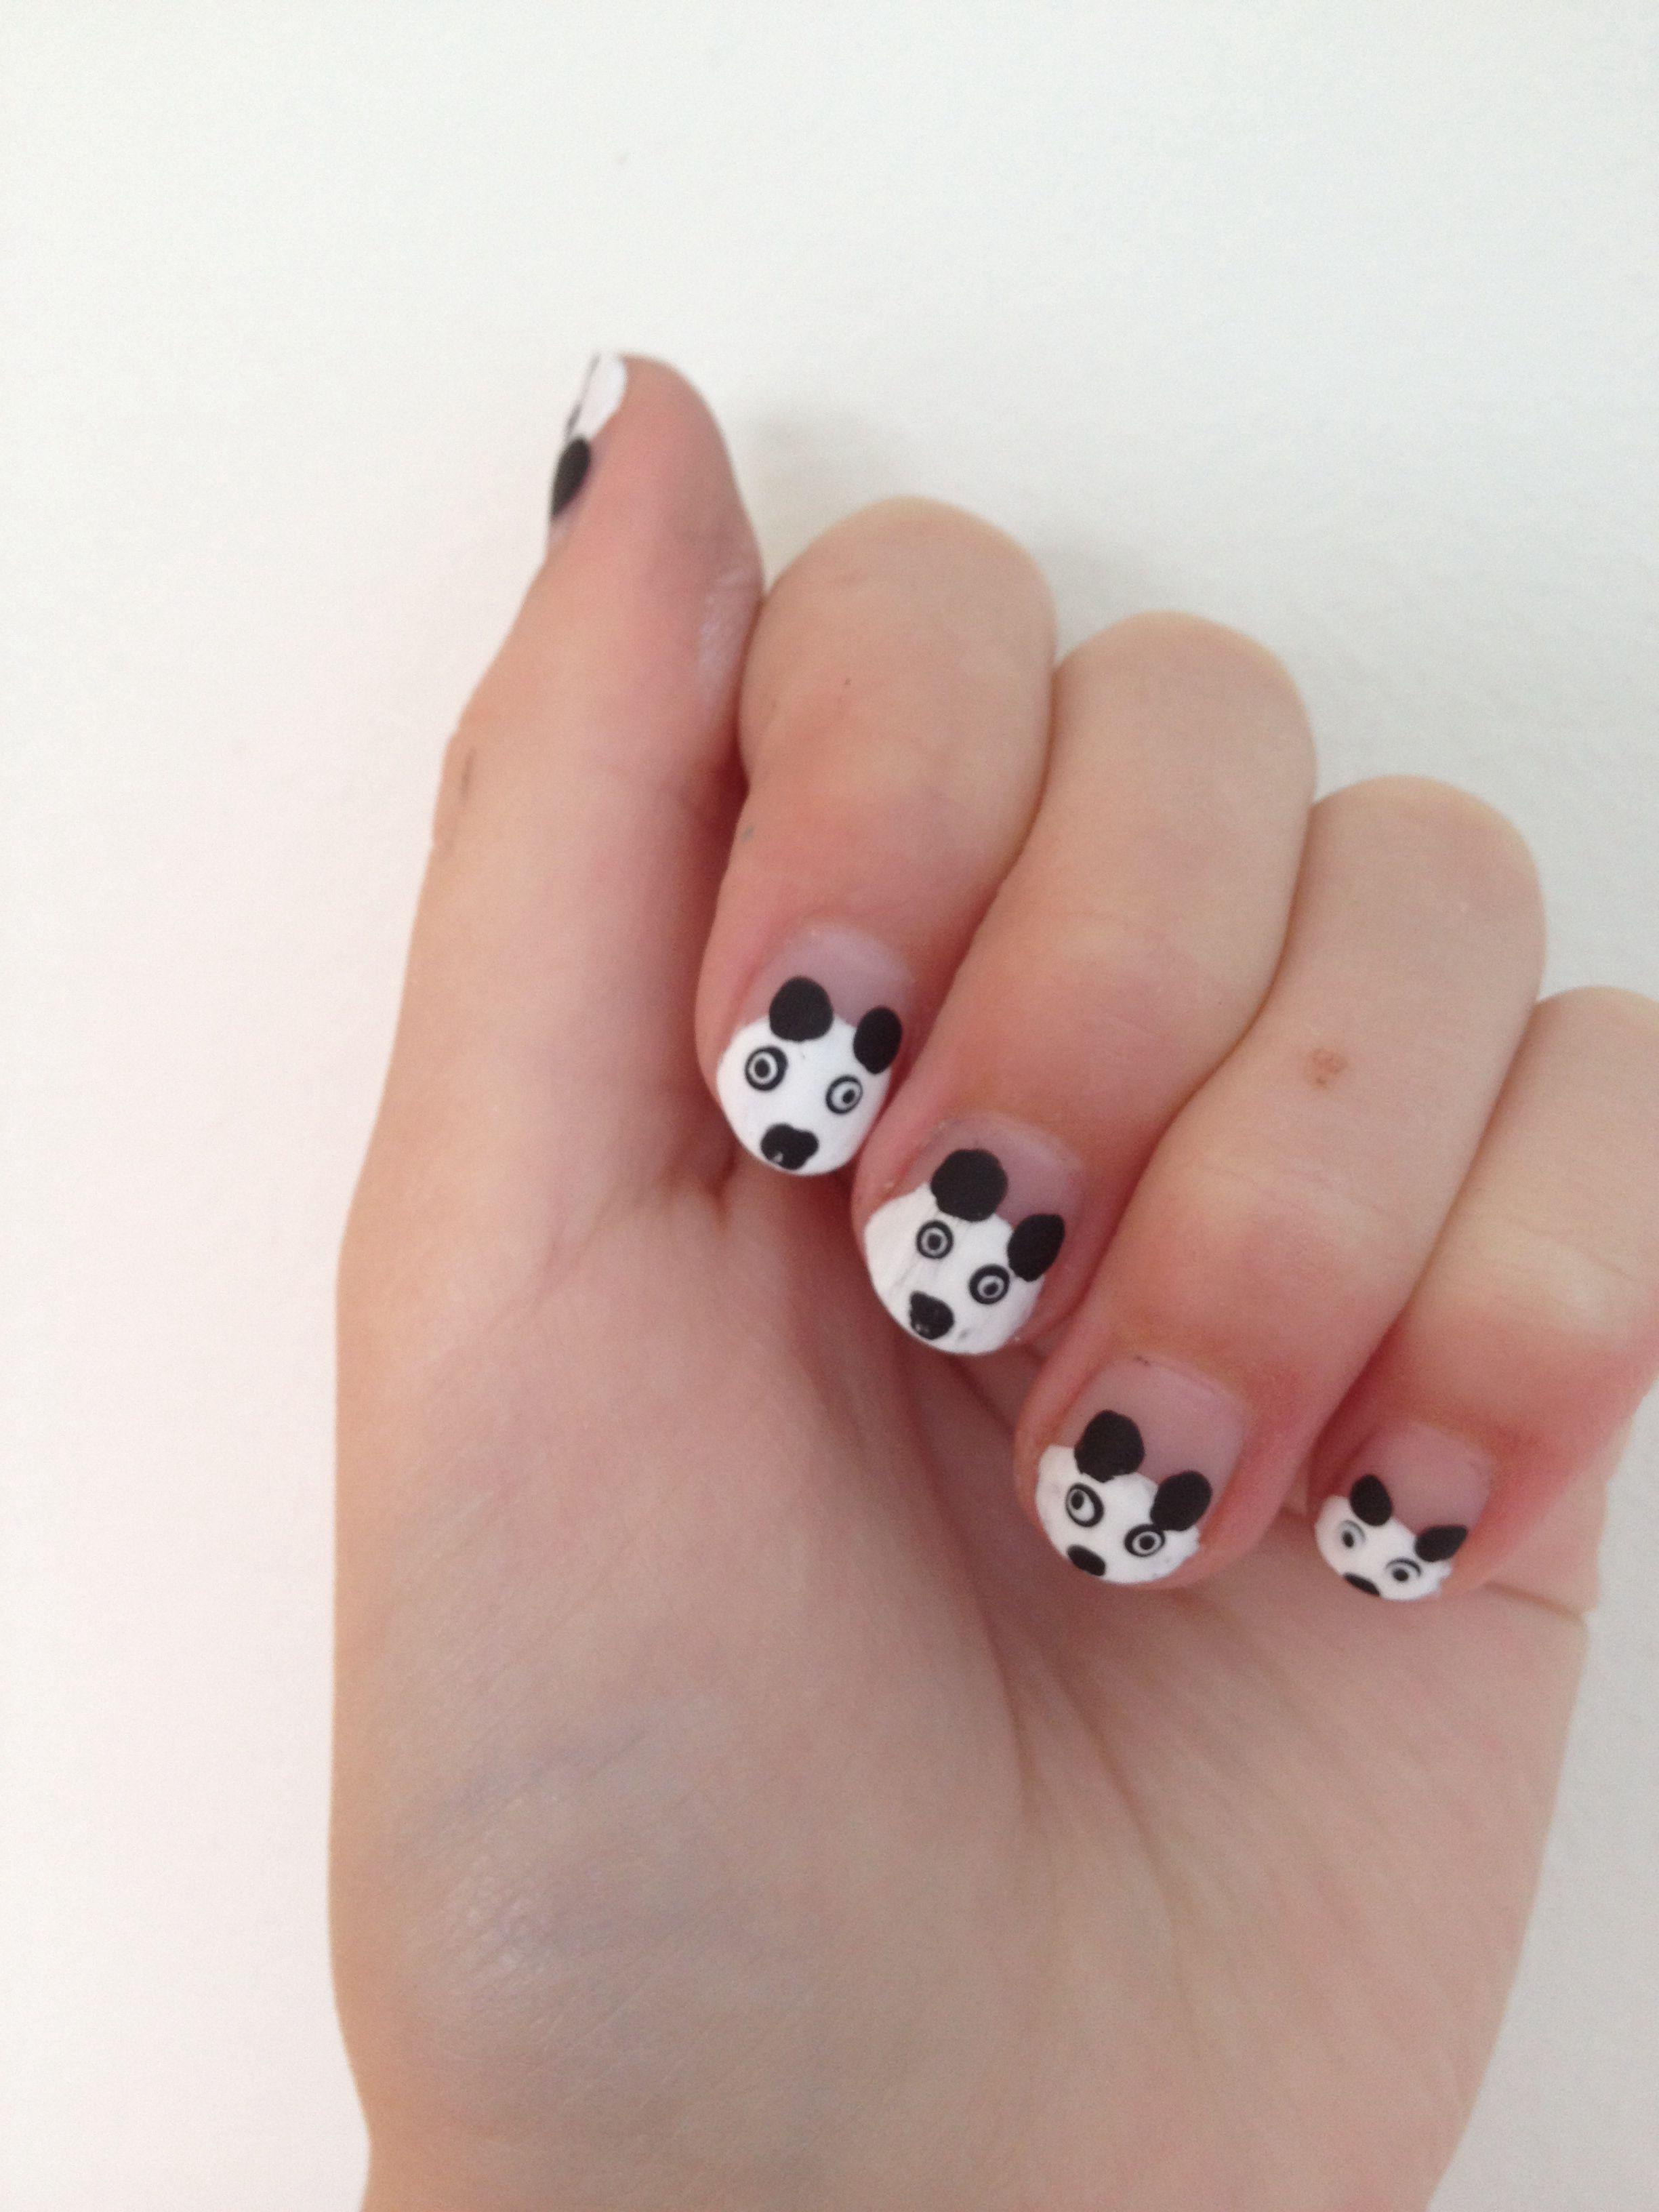 Panda design nails